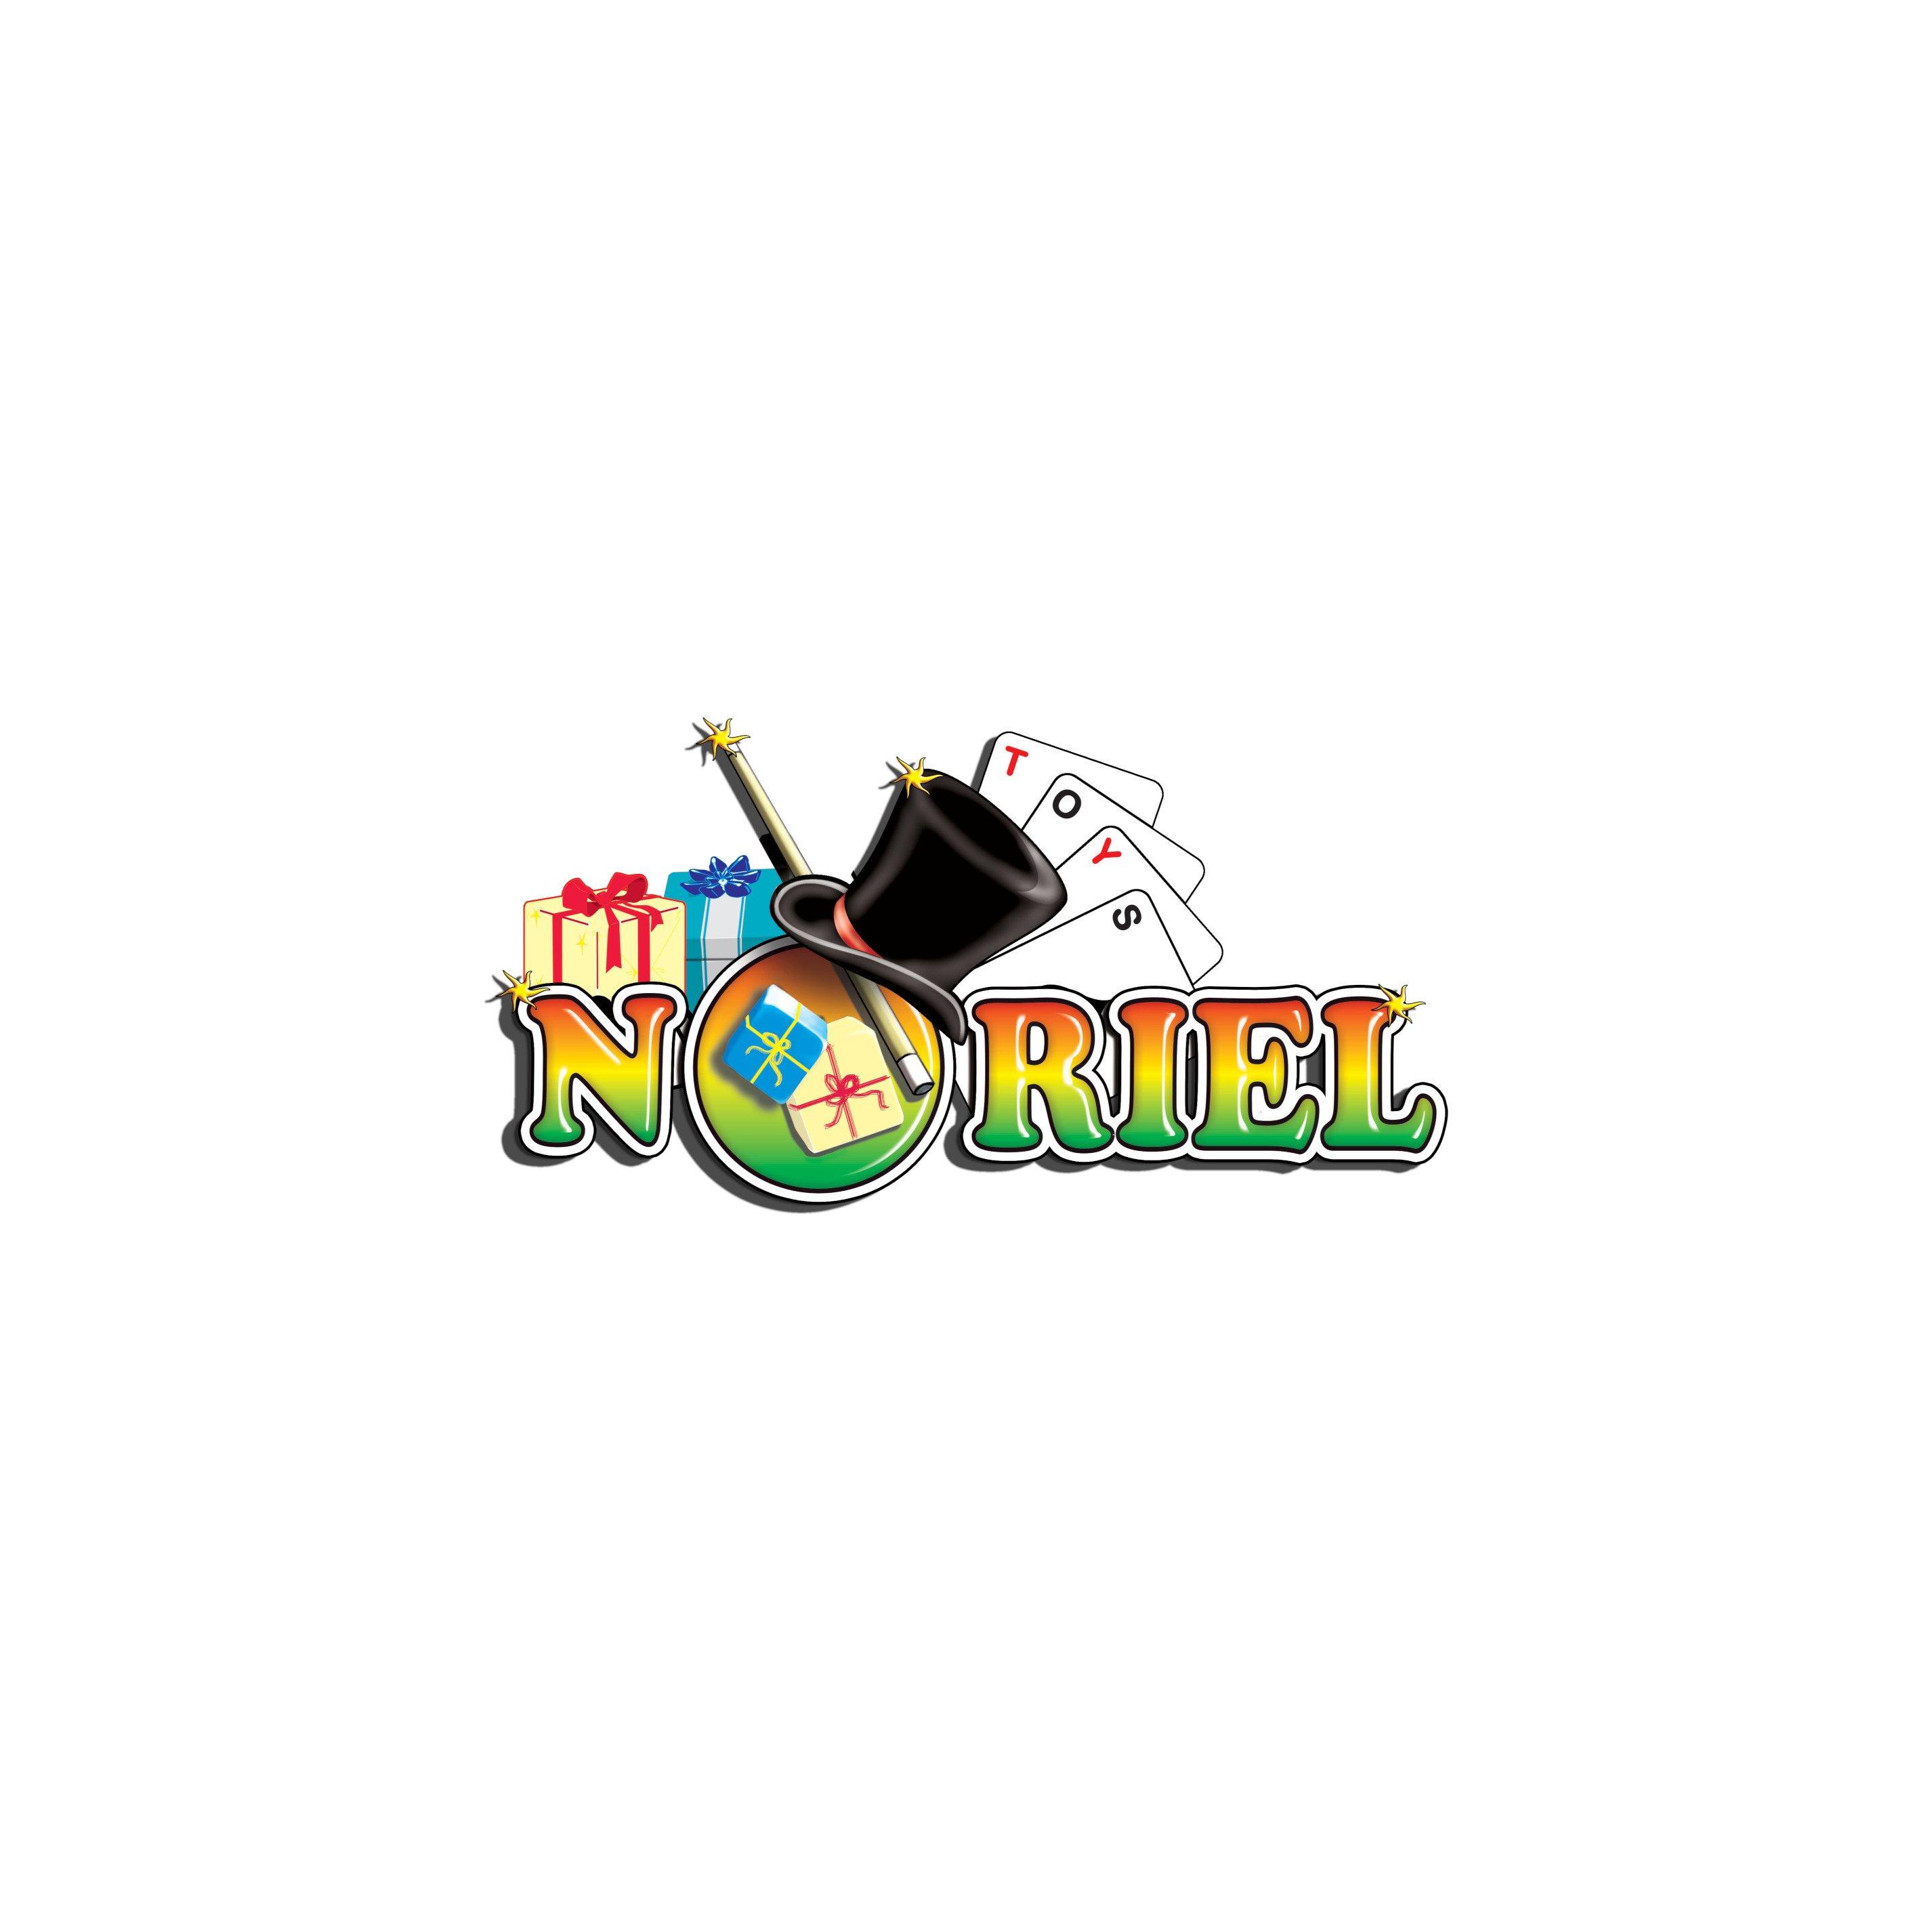 8805082_001w Creioane cerate Turncolor Bic, 12 culori